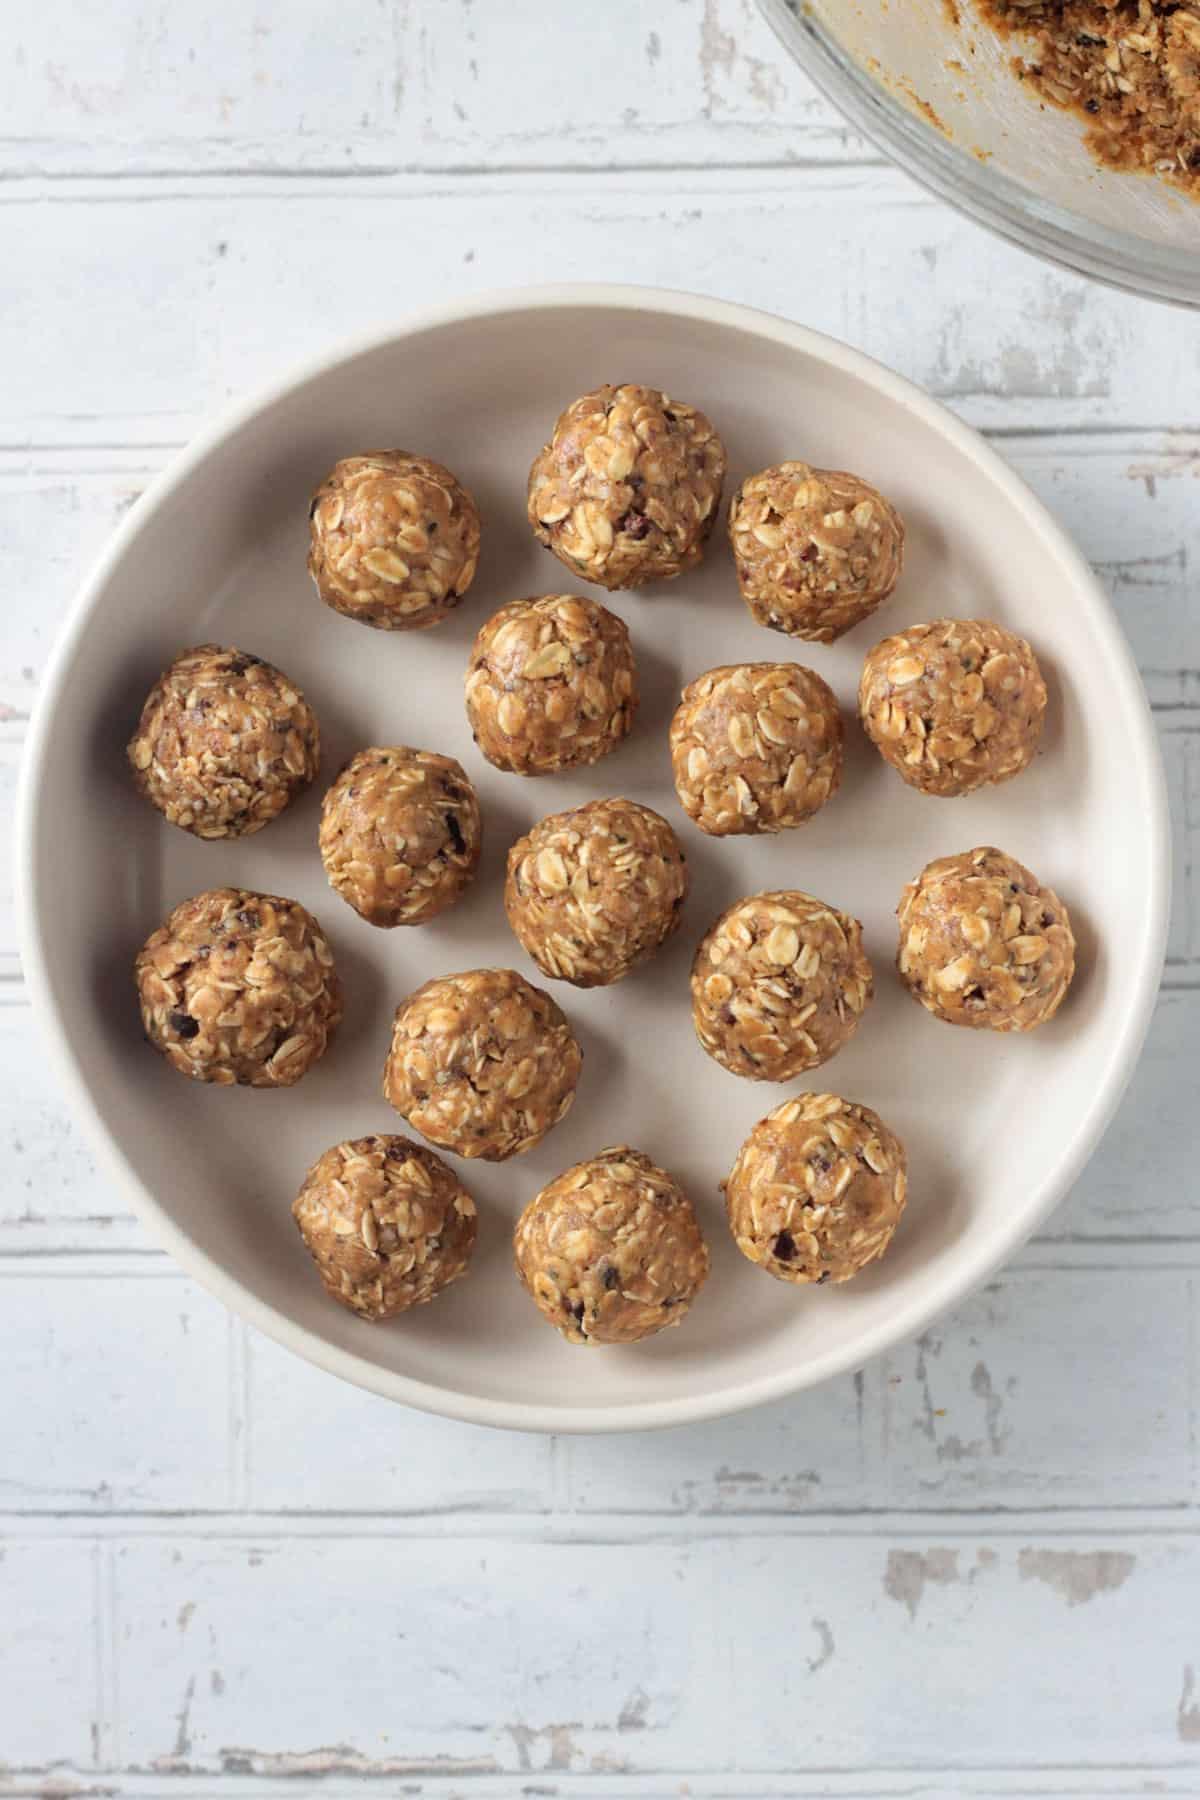 Oatmeal peanut butter balls arranged on a white plate.